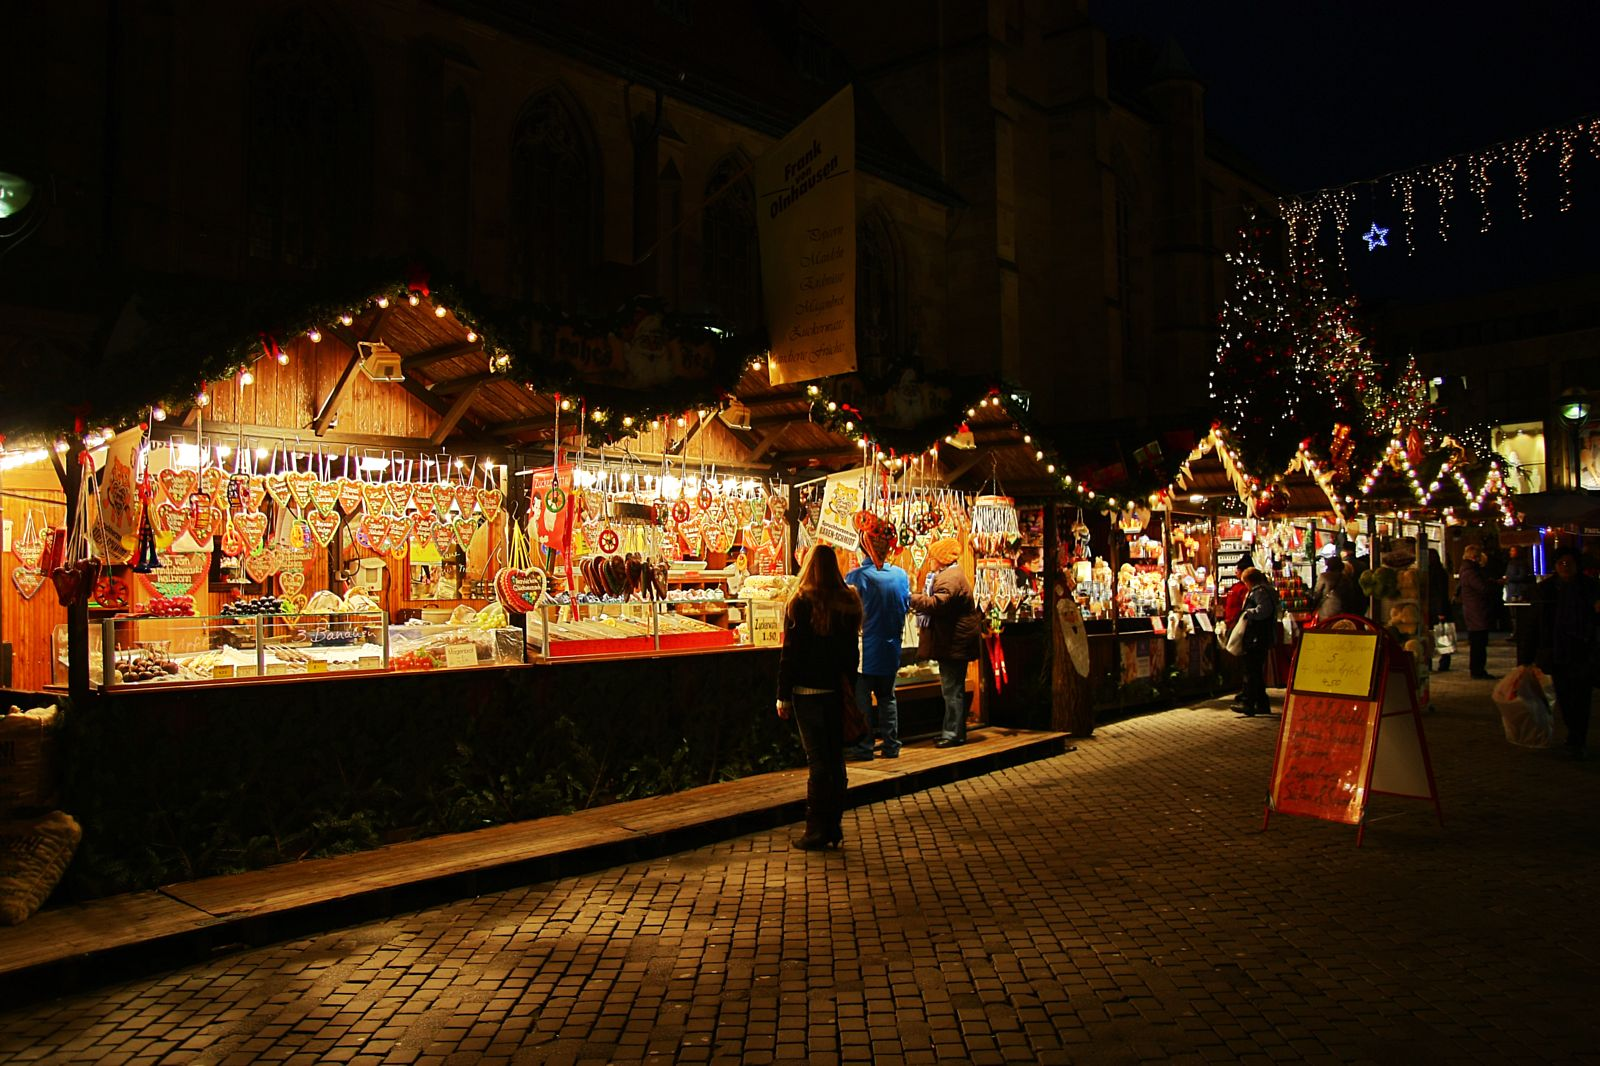 Weihnachtsmarkt Heilbronn.File Heilbronn Weihnachtsmarkt 2009 4 Jpg Wikimedia Commons